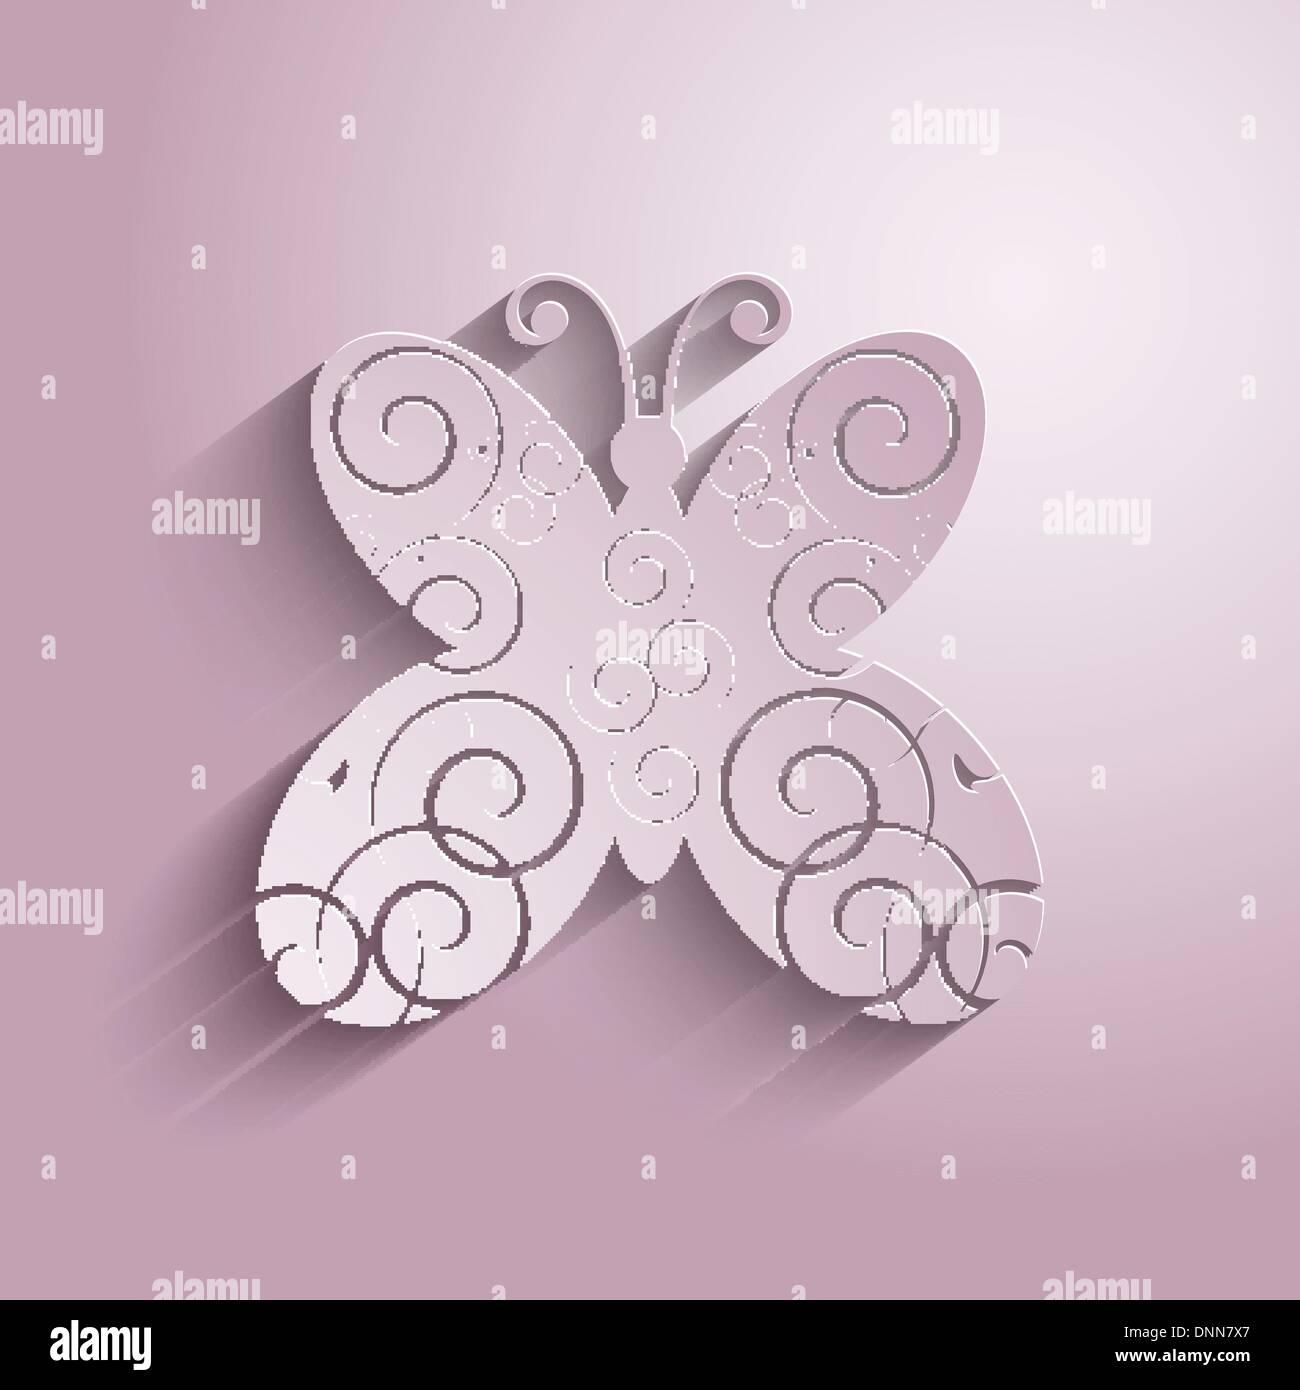 Fondo decorativo con un diseño mariposa Imagen De Stock